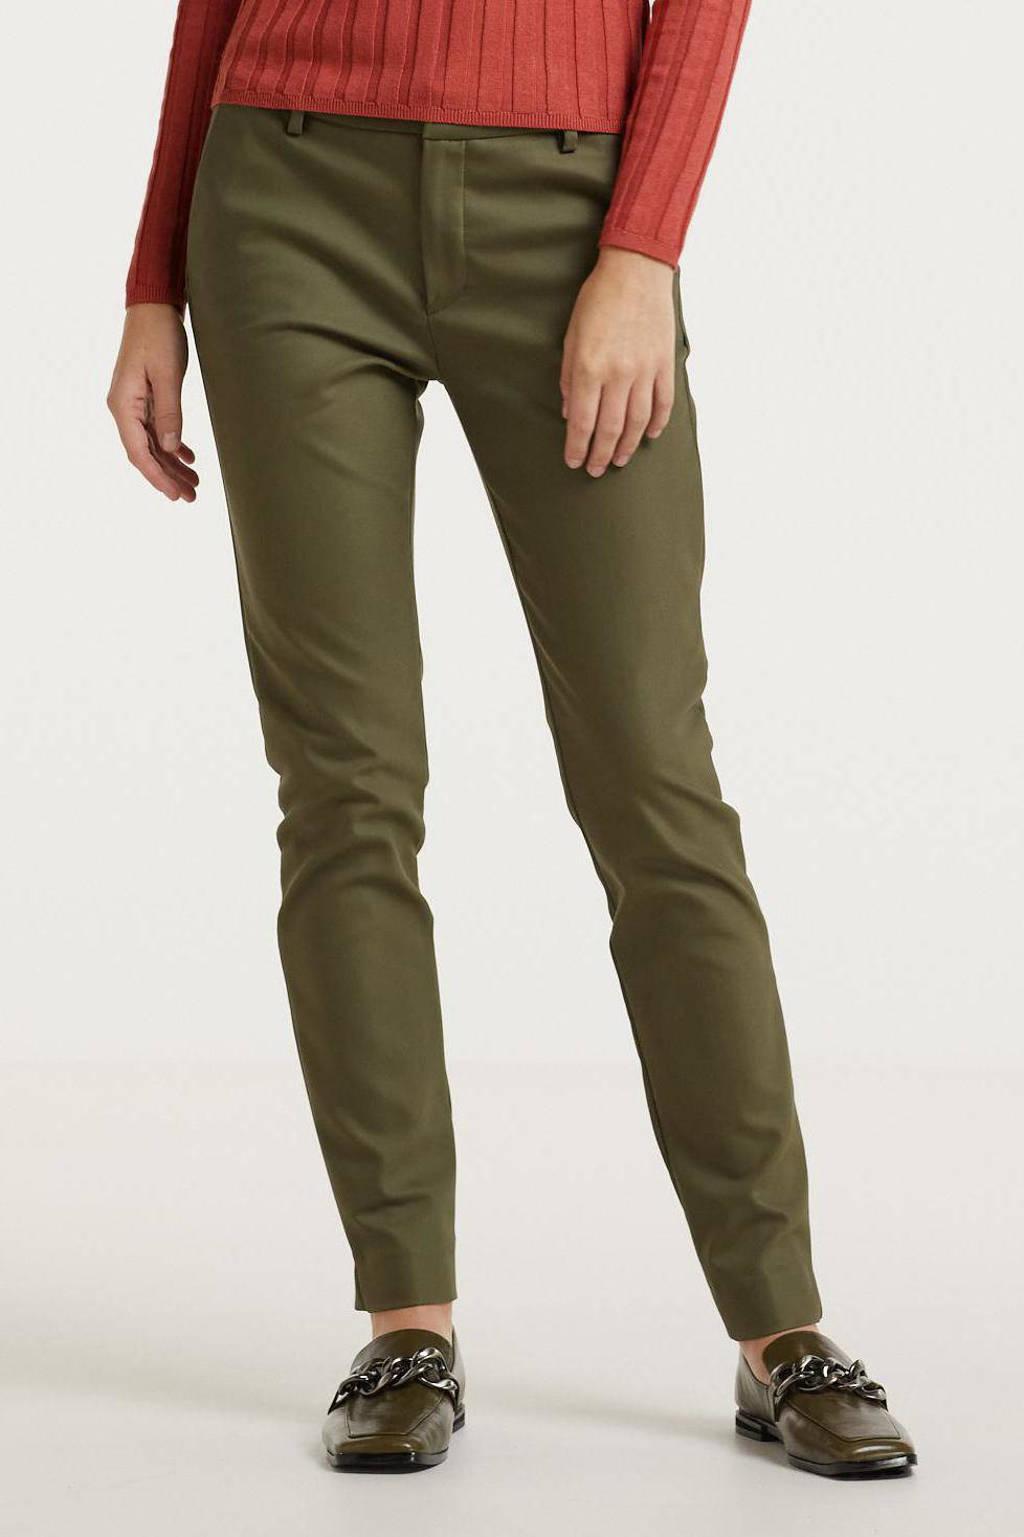 Mos Mosh regular fit pantalon Abbey Night Pant Sustainable donkergroen, 507 grape leaf